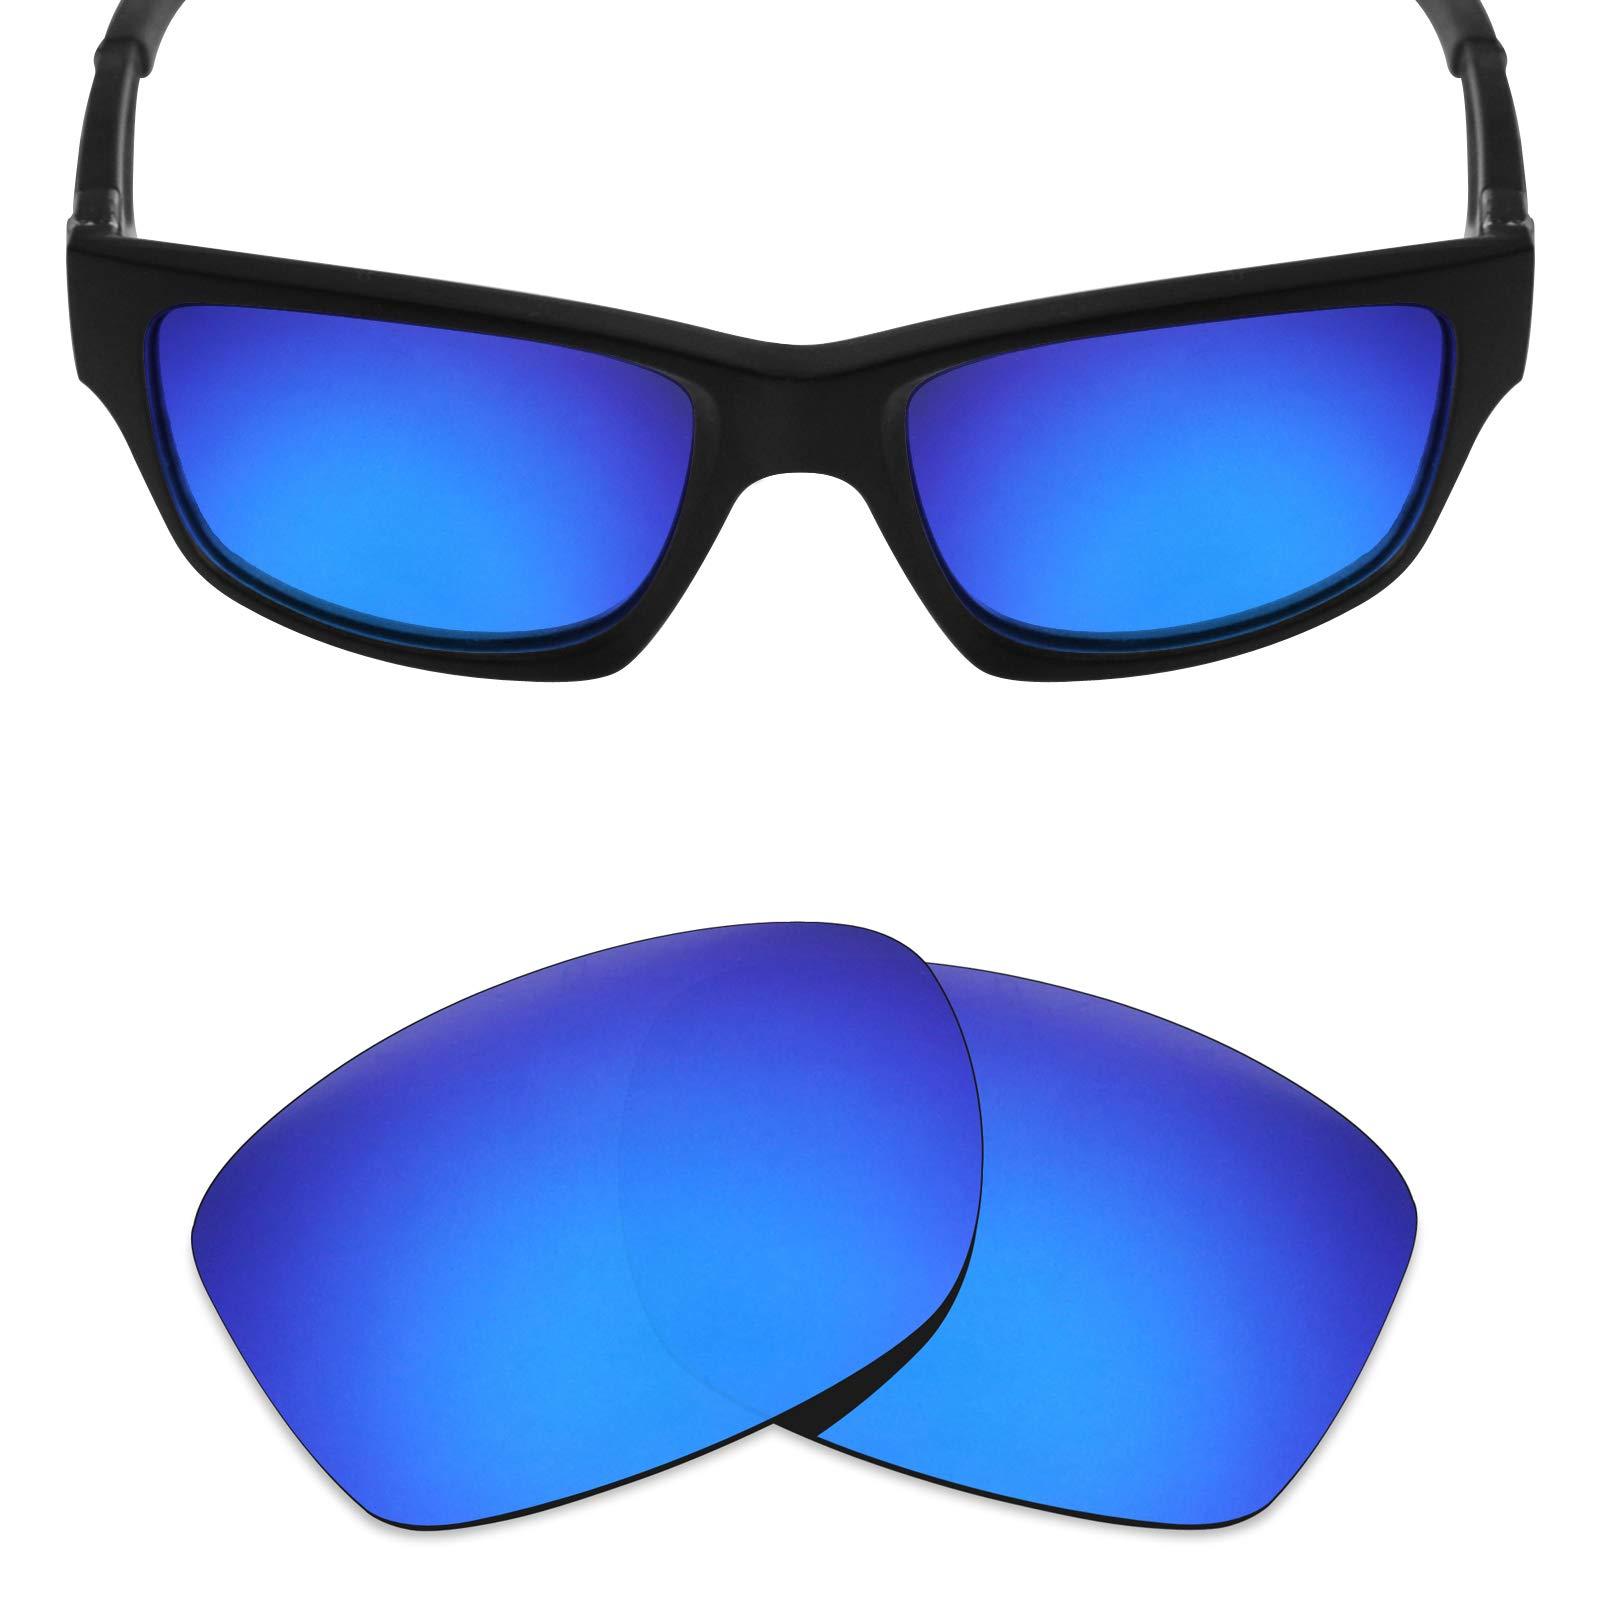 ebd85864781 Mryok Polarized Replacement Lenses for Oakley Jupiter Squared Jupiter  Carbon - Deep Blue